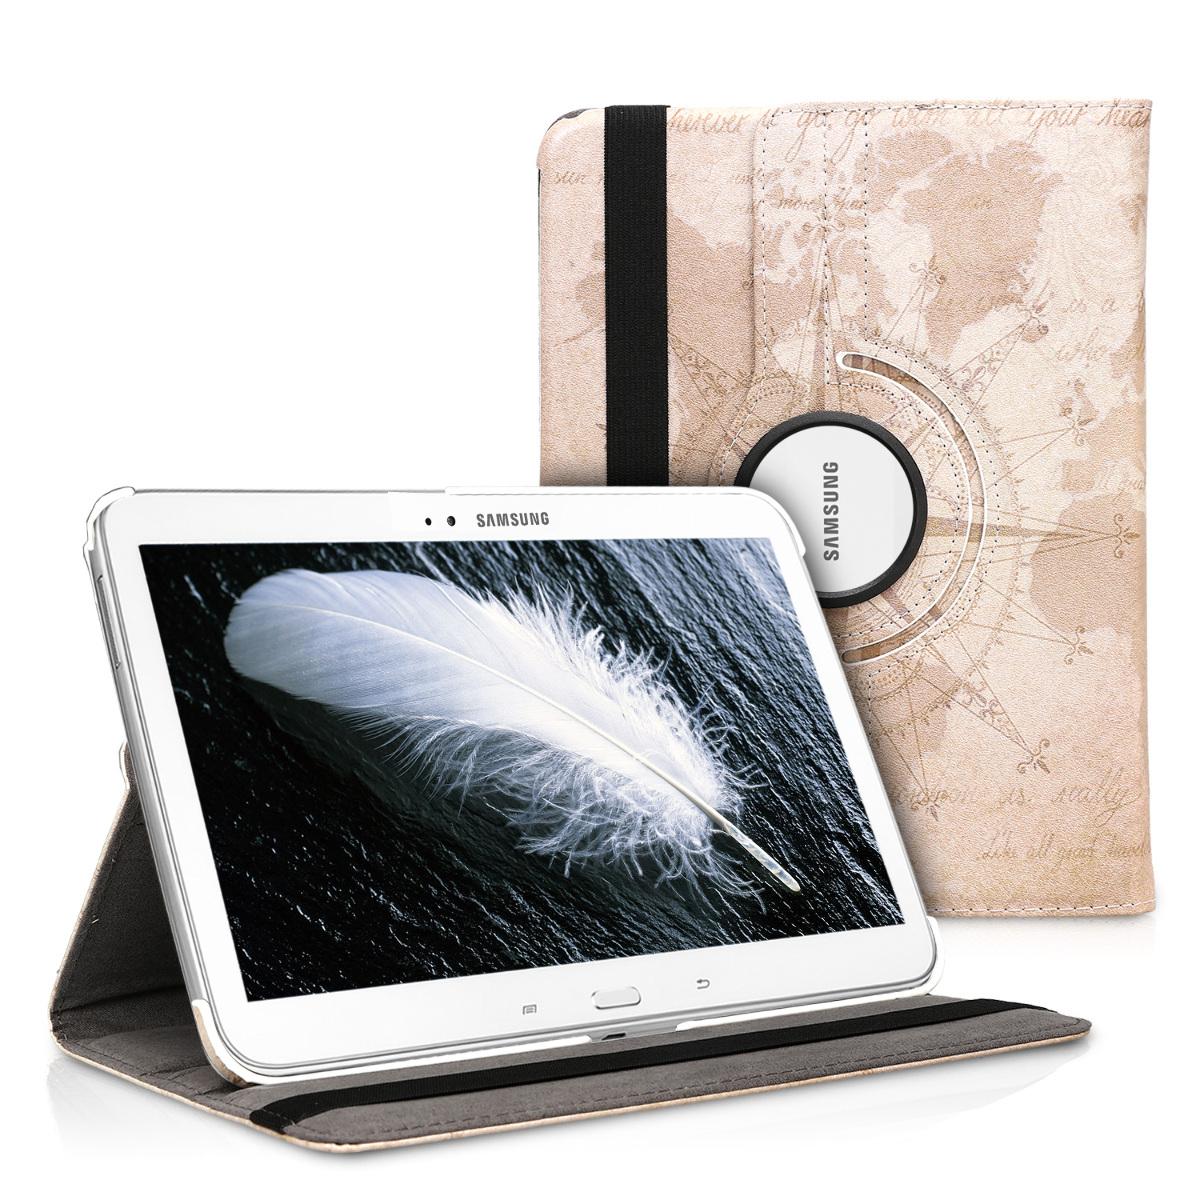 KW Θήκη 360° Samsung Galaxy Tab 3 10.1 P5200/P5210 - Brown / Light Brown (17318.15)